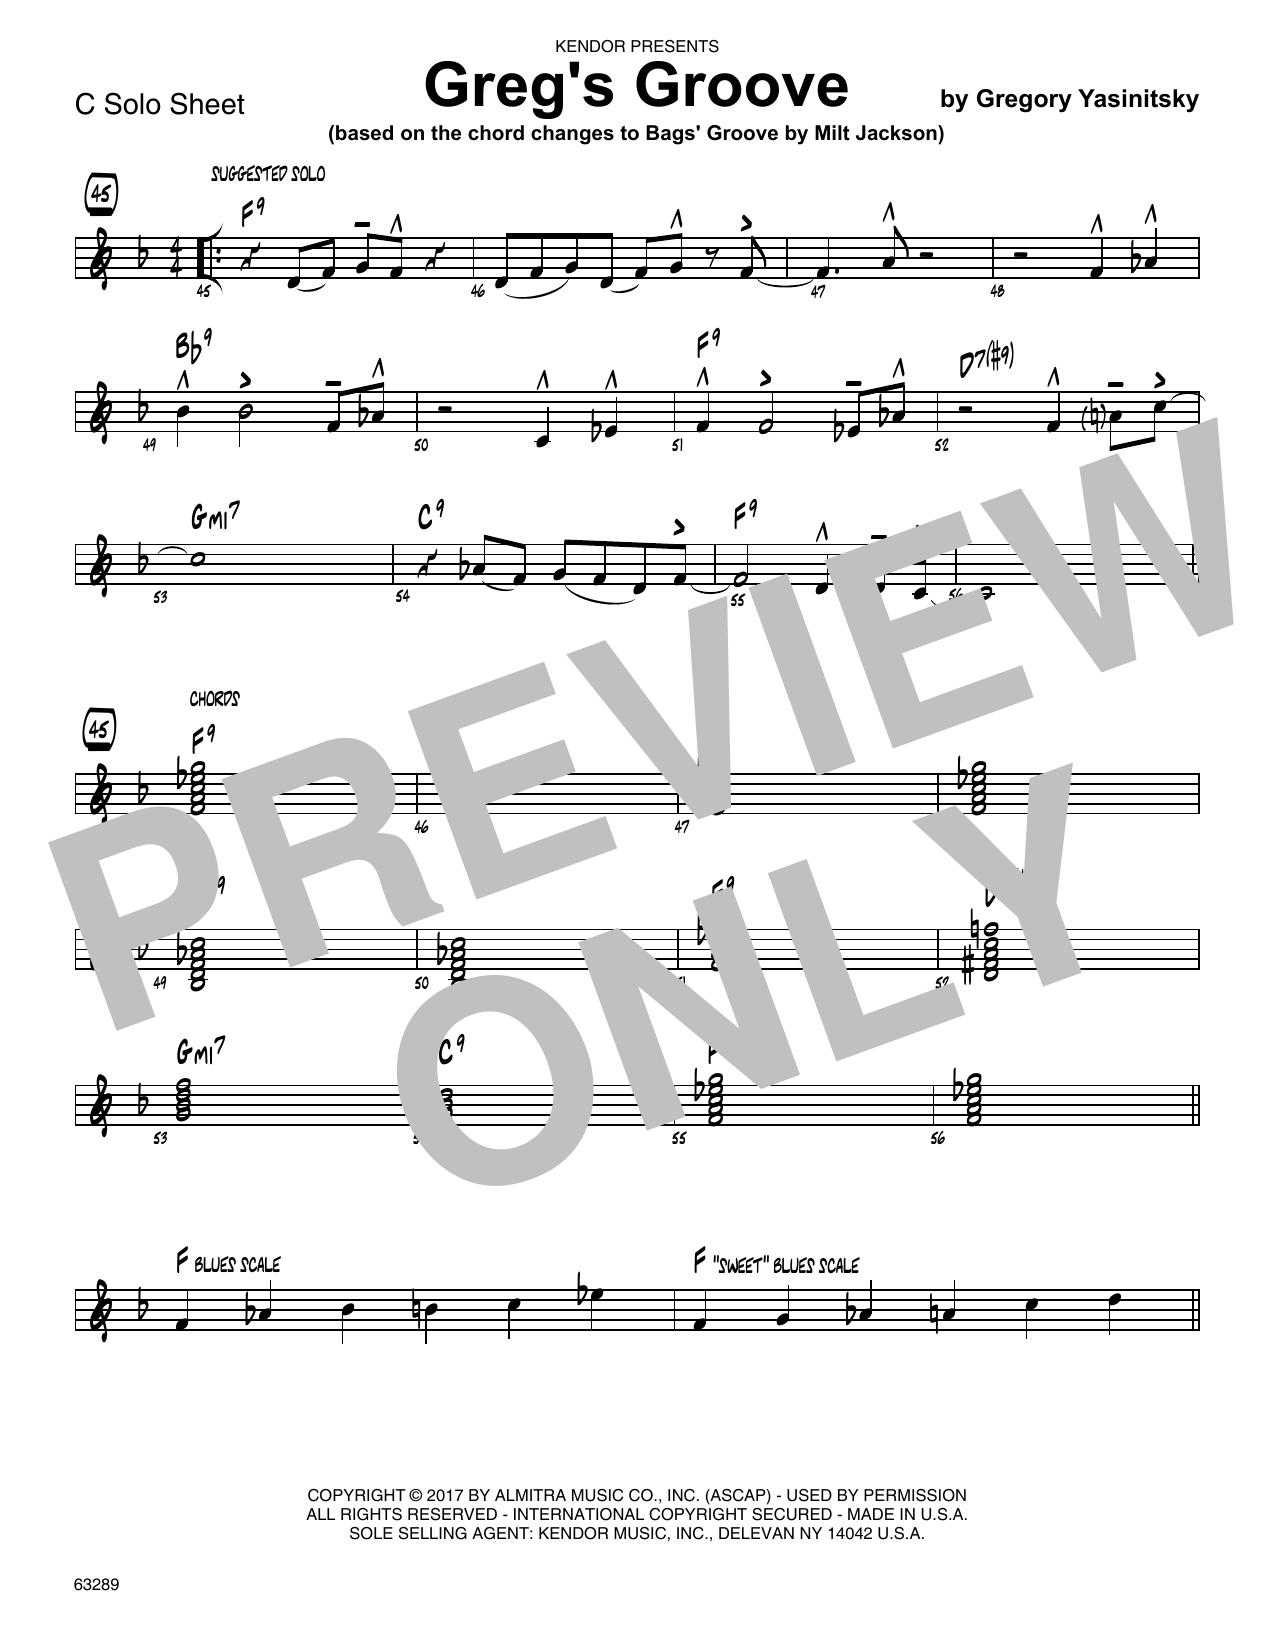 Greg's Groove - Solo Sheet - Trumpet Sheet Music